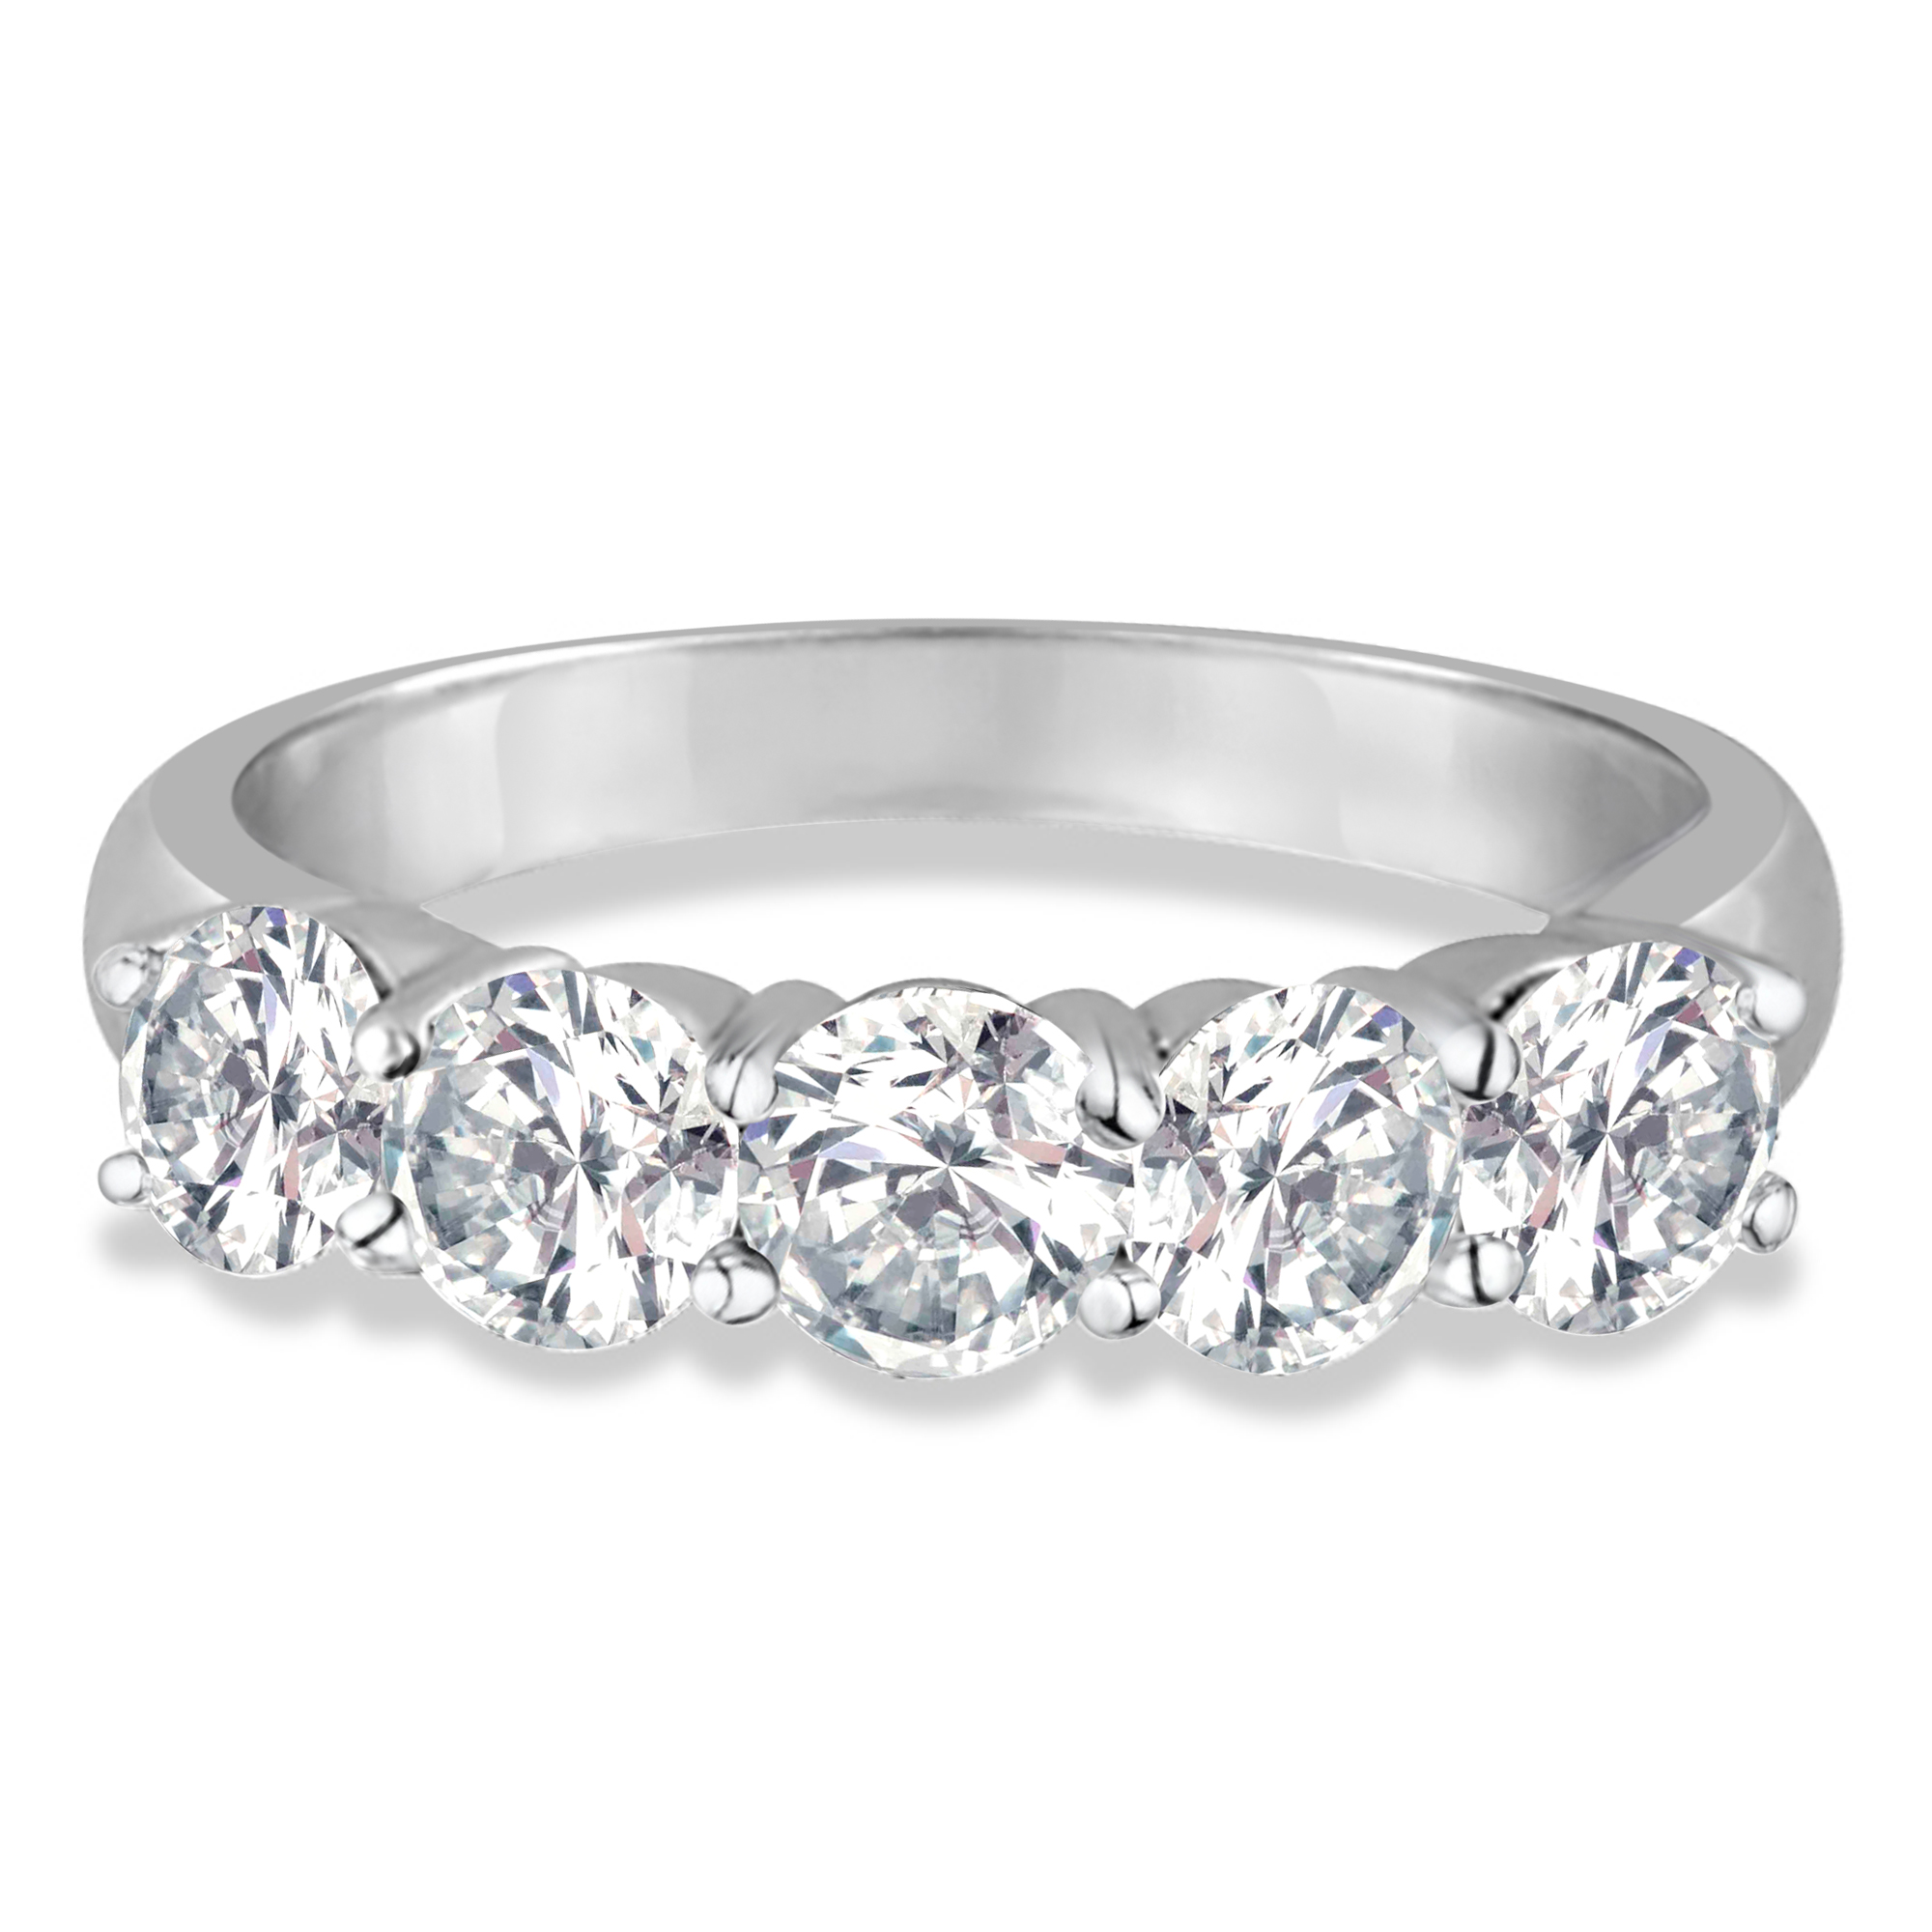 Five Stone Diamond Ring Anniversary Band 18k White Gold. Male Bands. Popular Bangle Bracelets. Food Rings. Wide Bangle Bracelets. Custom Letter Pendant. Small Diamond Wedding Rings. 8 Bangle Bracelets. 4ct Diamond